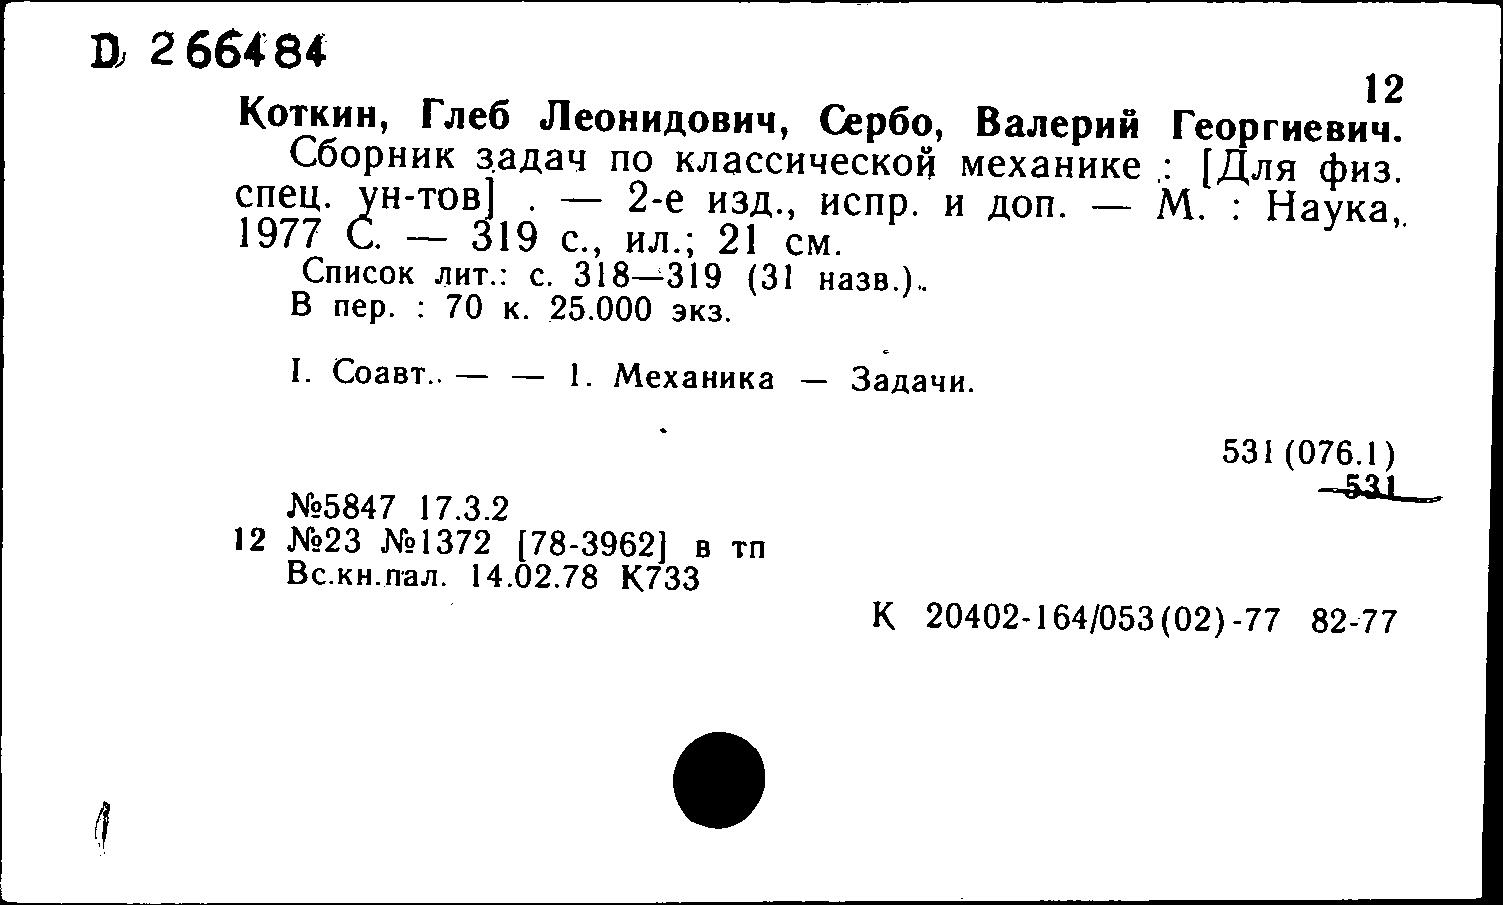 Решебник Коткин Сербо